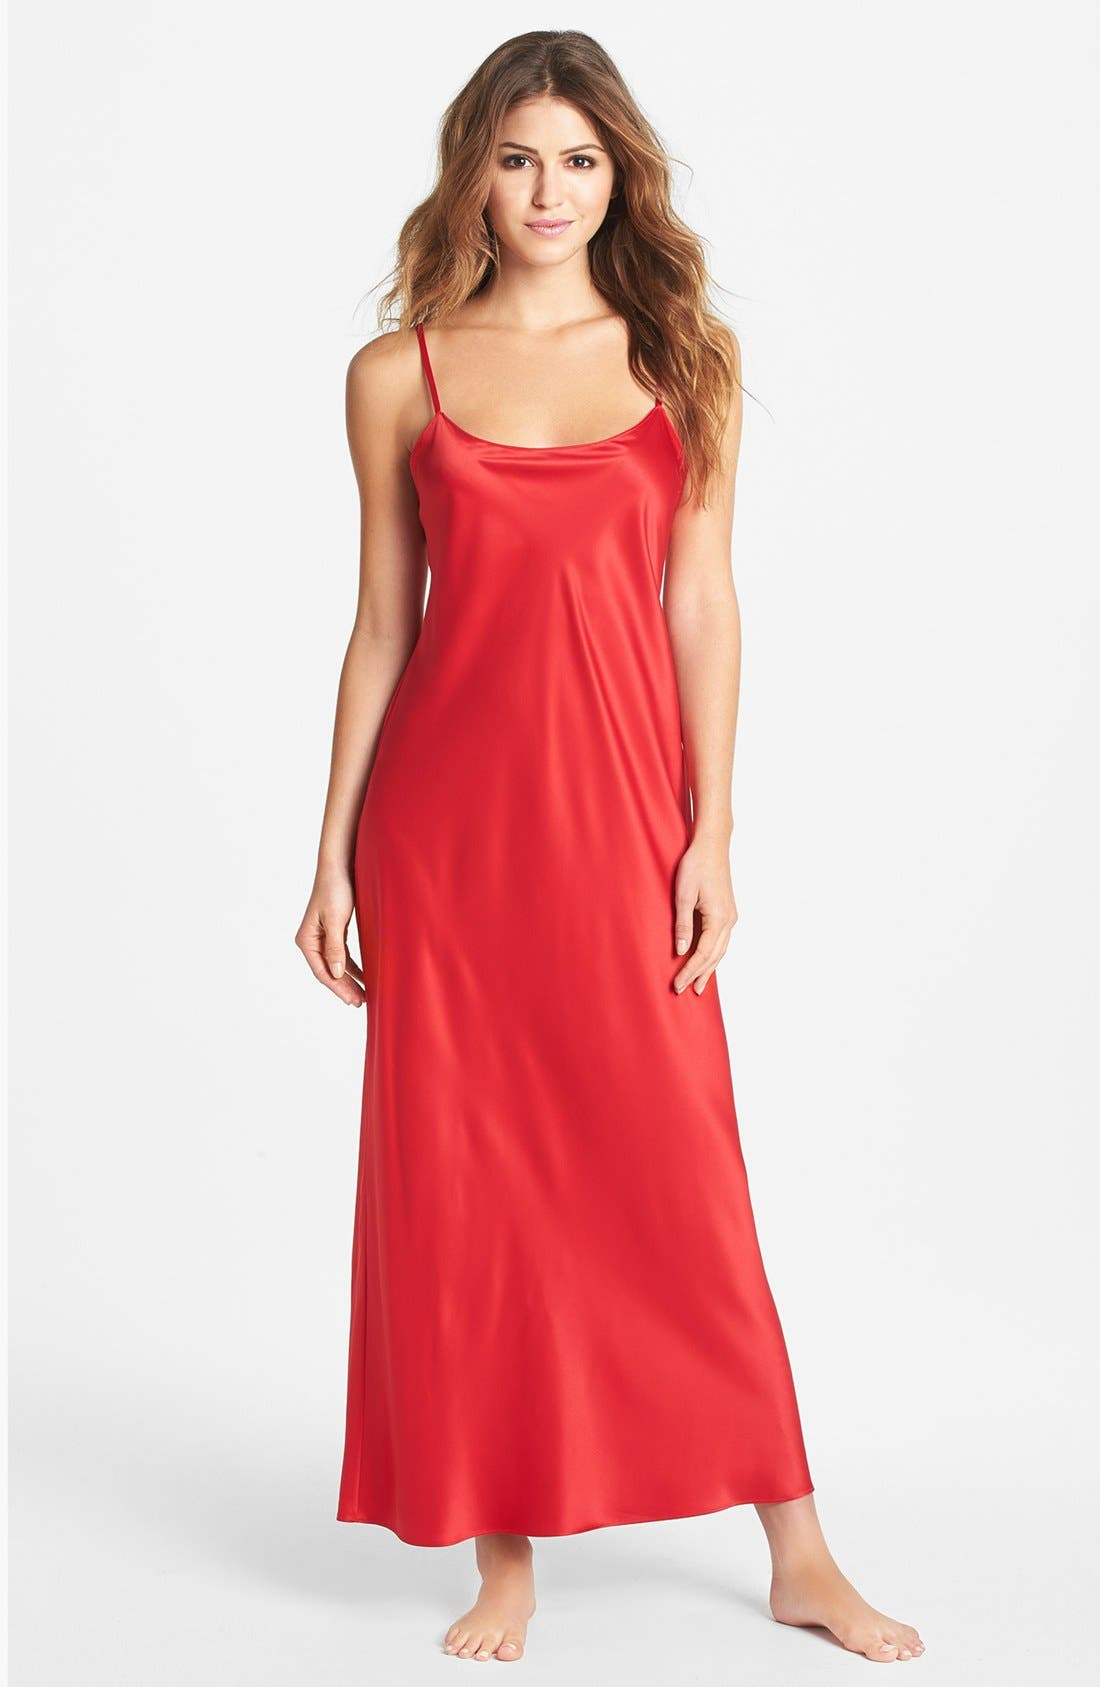 Alternate Image 1 Selected - Natori Long Charmeuse Nightgown